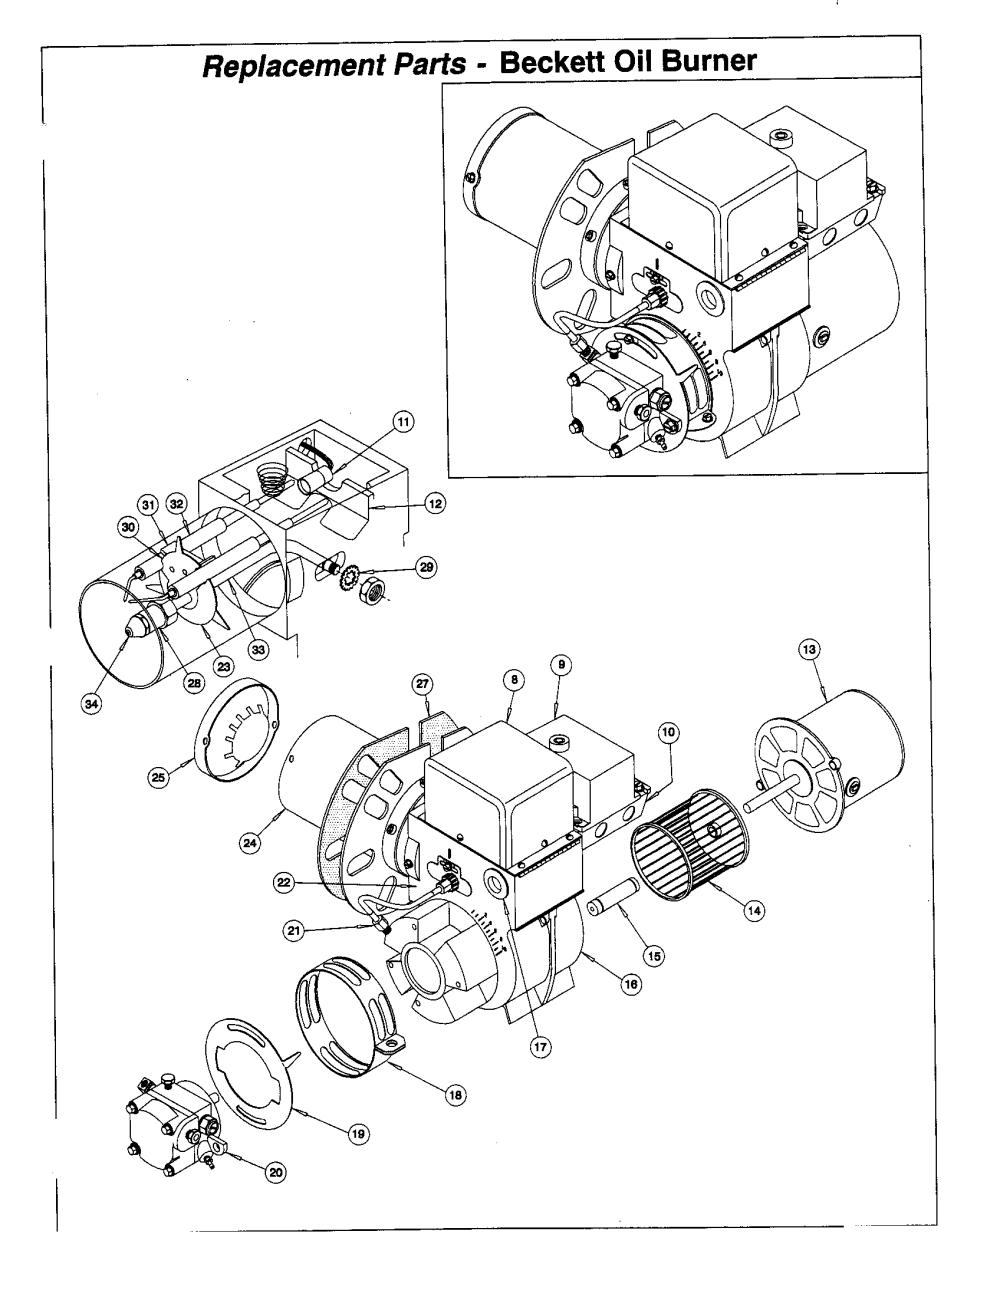 medium resolution of icp lm05100bgb1 replacement parts beckett oil burner diagram